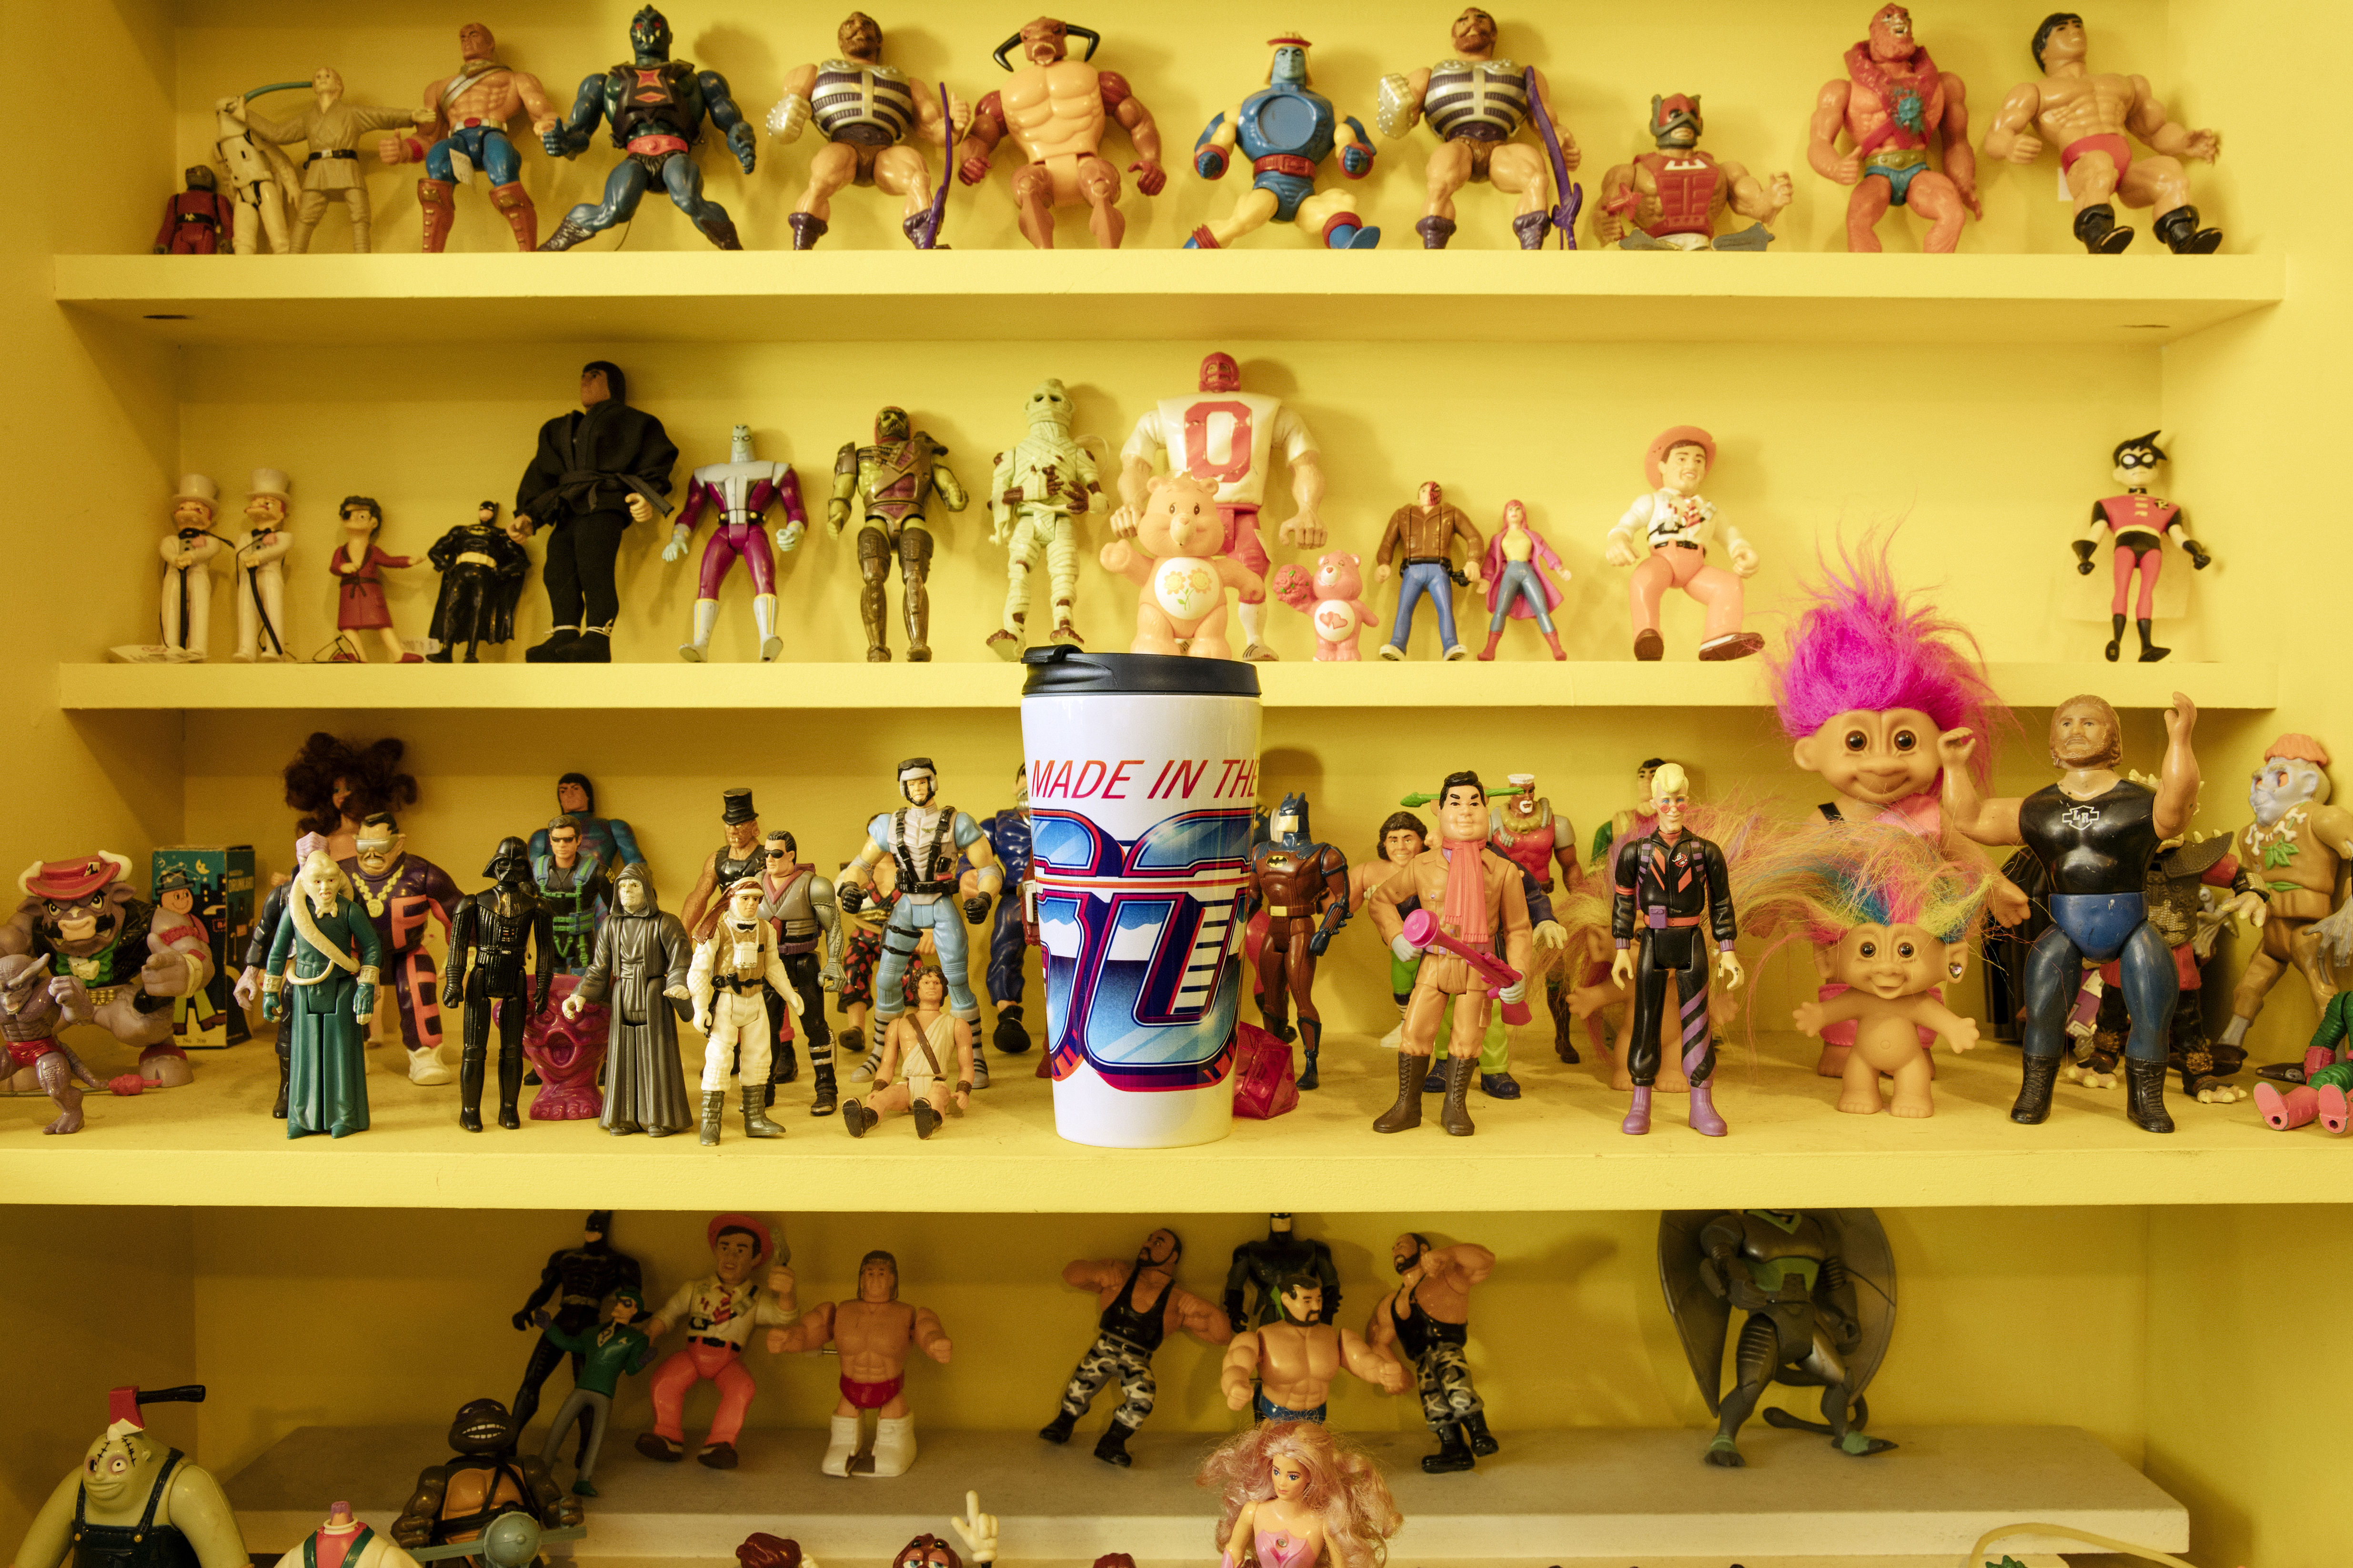 80 Toy Action Figure Shelves - MadeInThe80s_travelmug_Simple 80 Toy Action Figure Shelves - MadeInThe80s_travelmug  You Should Have_851335.jpg